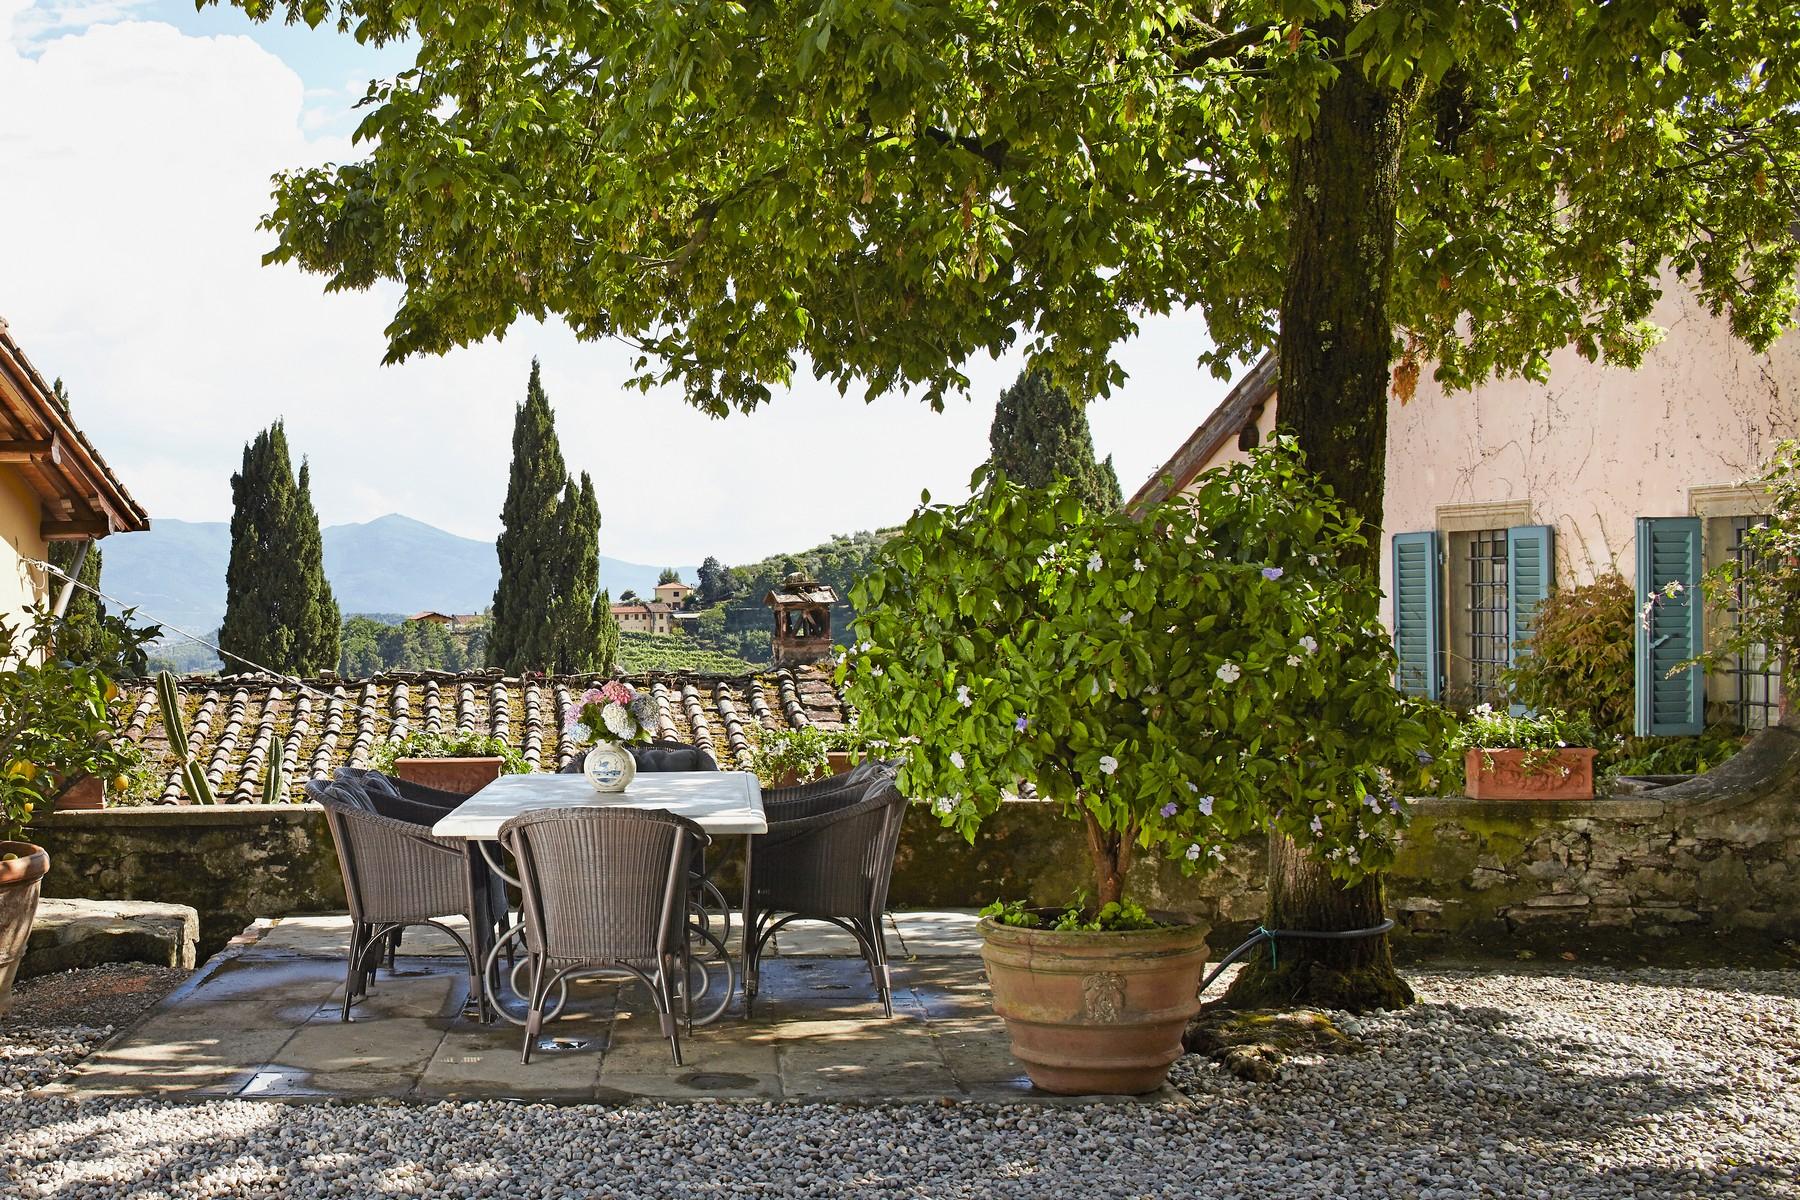 Villa in Vendita a Lucca: 5 locali, 2500 mq - Foto 25